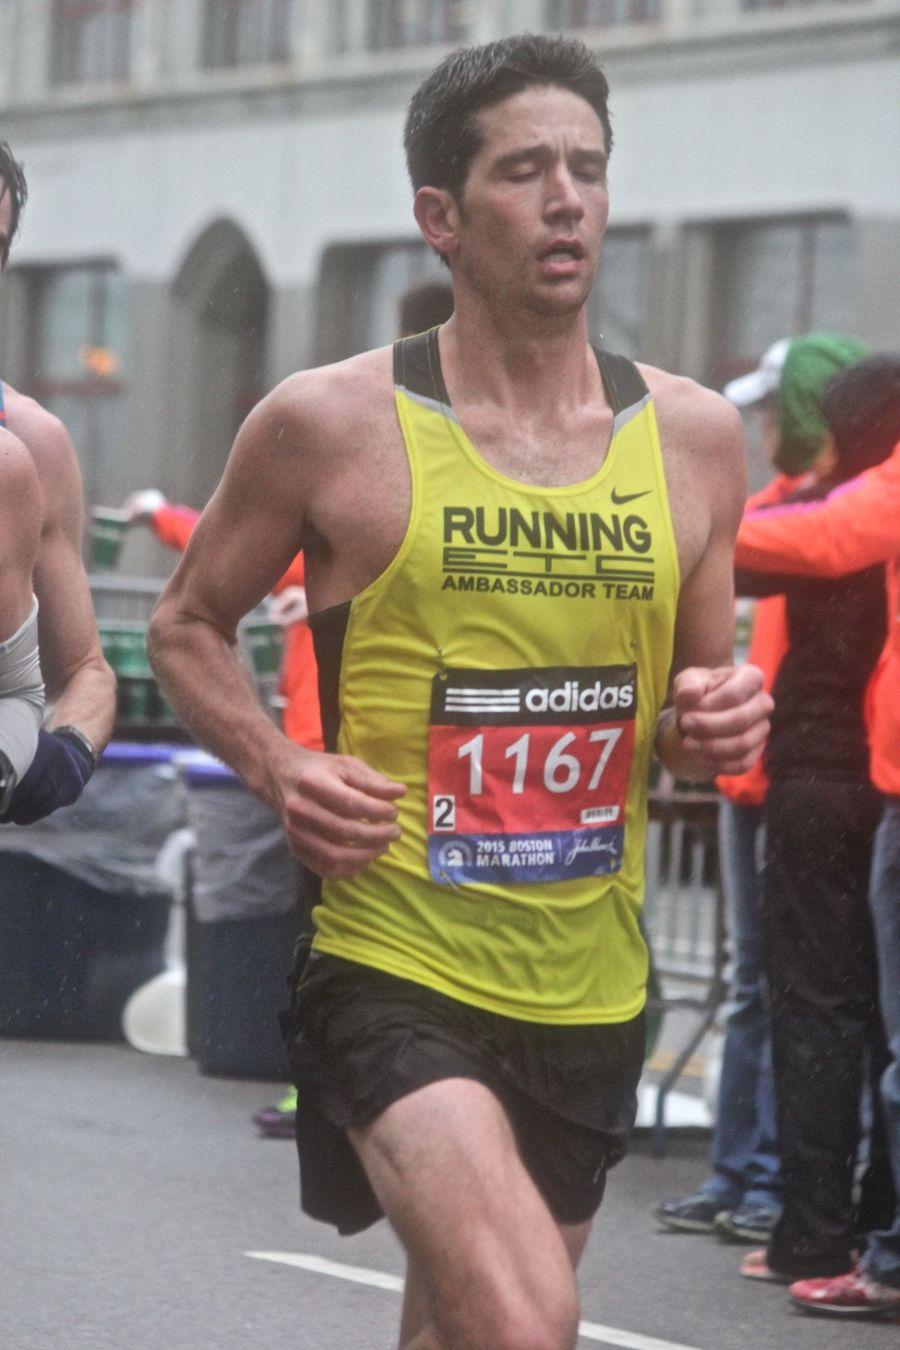 boston marathon april 20 2015 racer number 1167